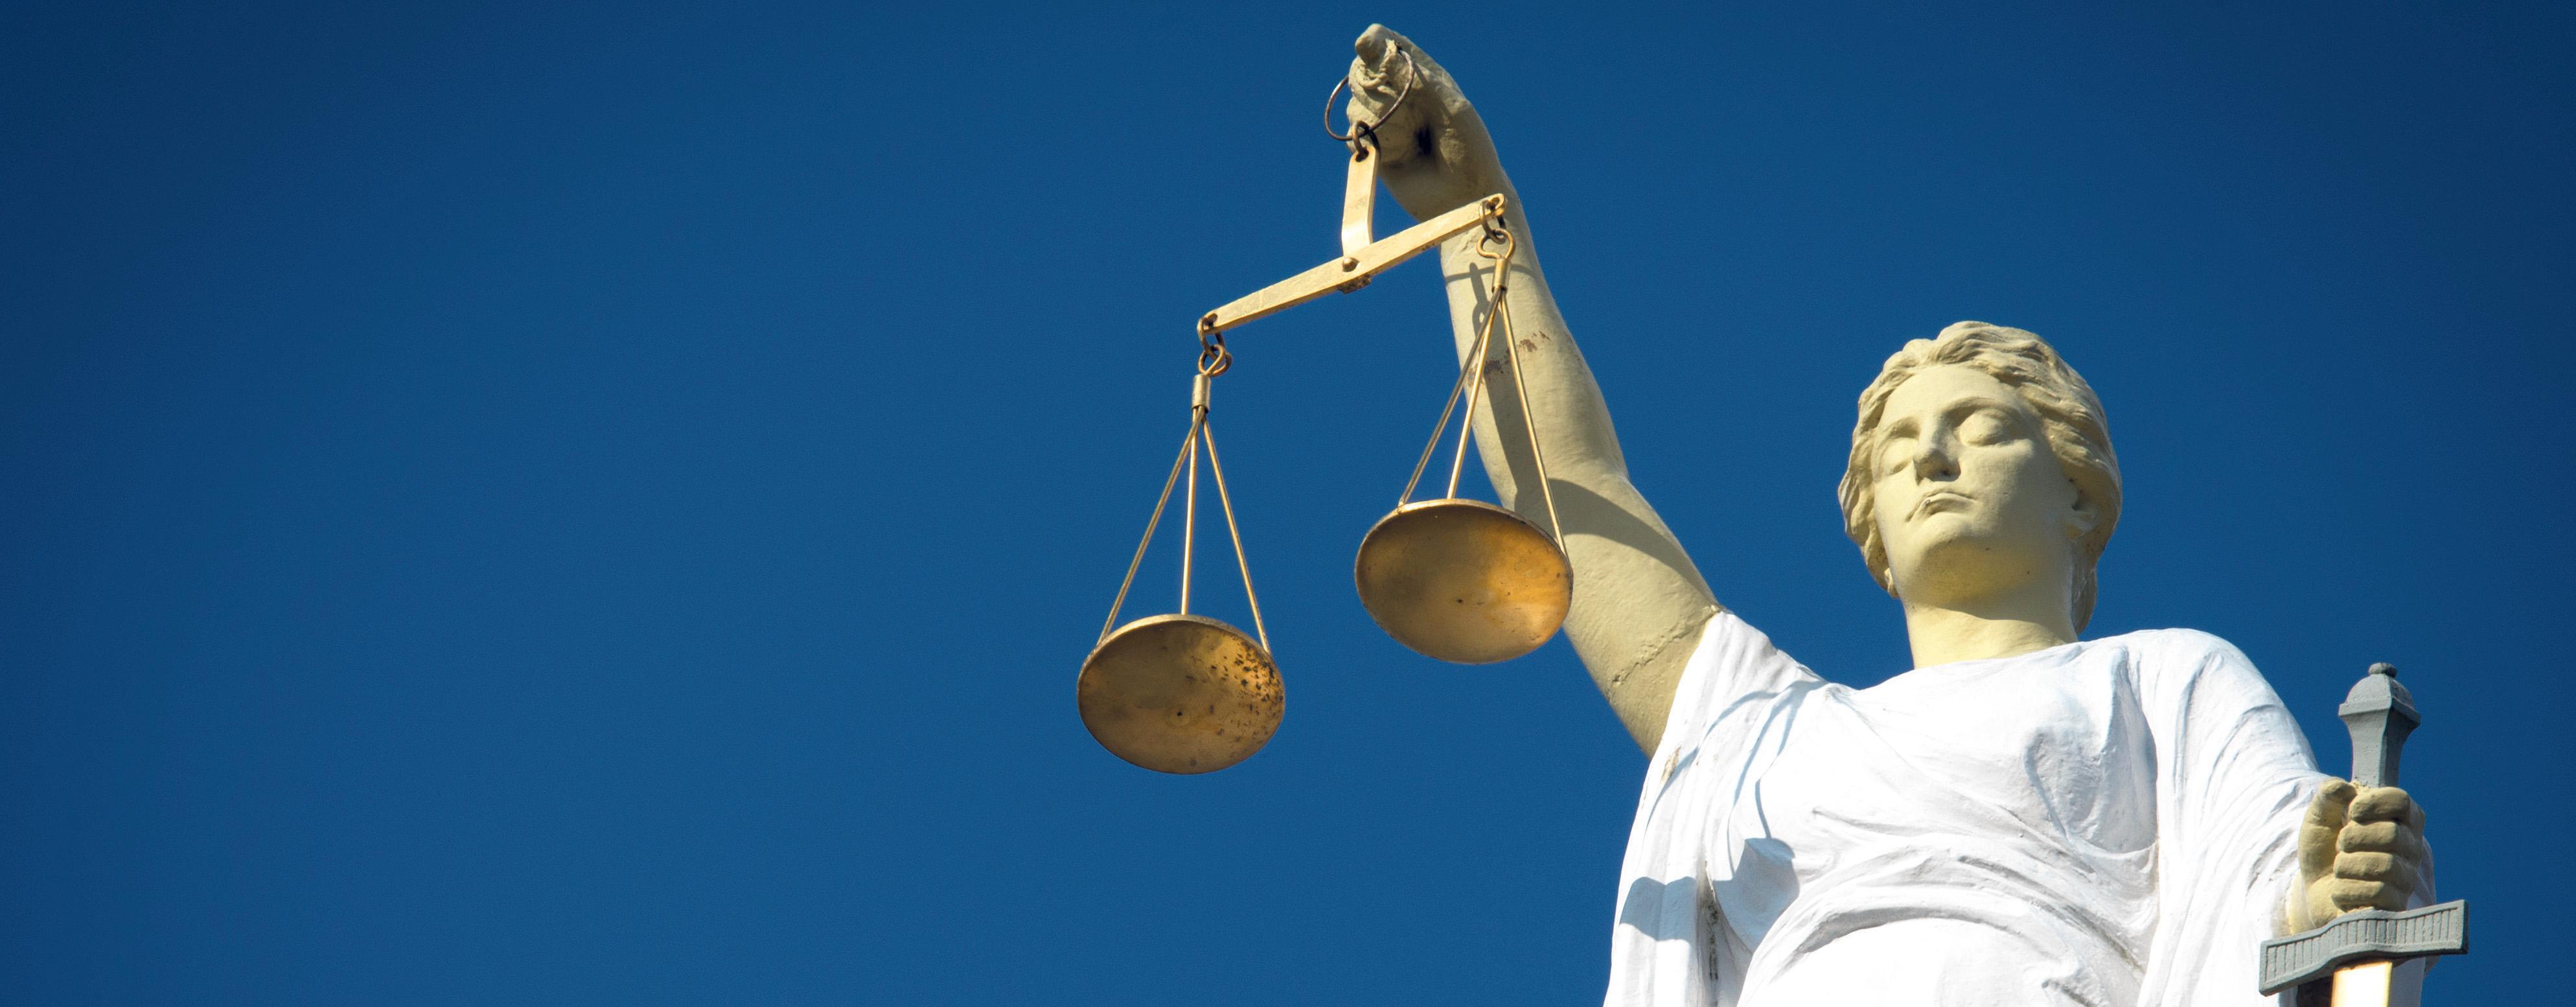 Forse strafeis tegen Hillegommer (19) om agressie tegen vriendin, politie en medewerkers justitie